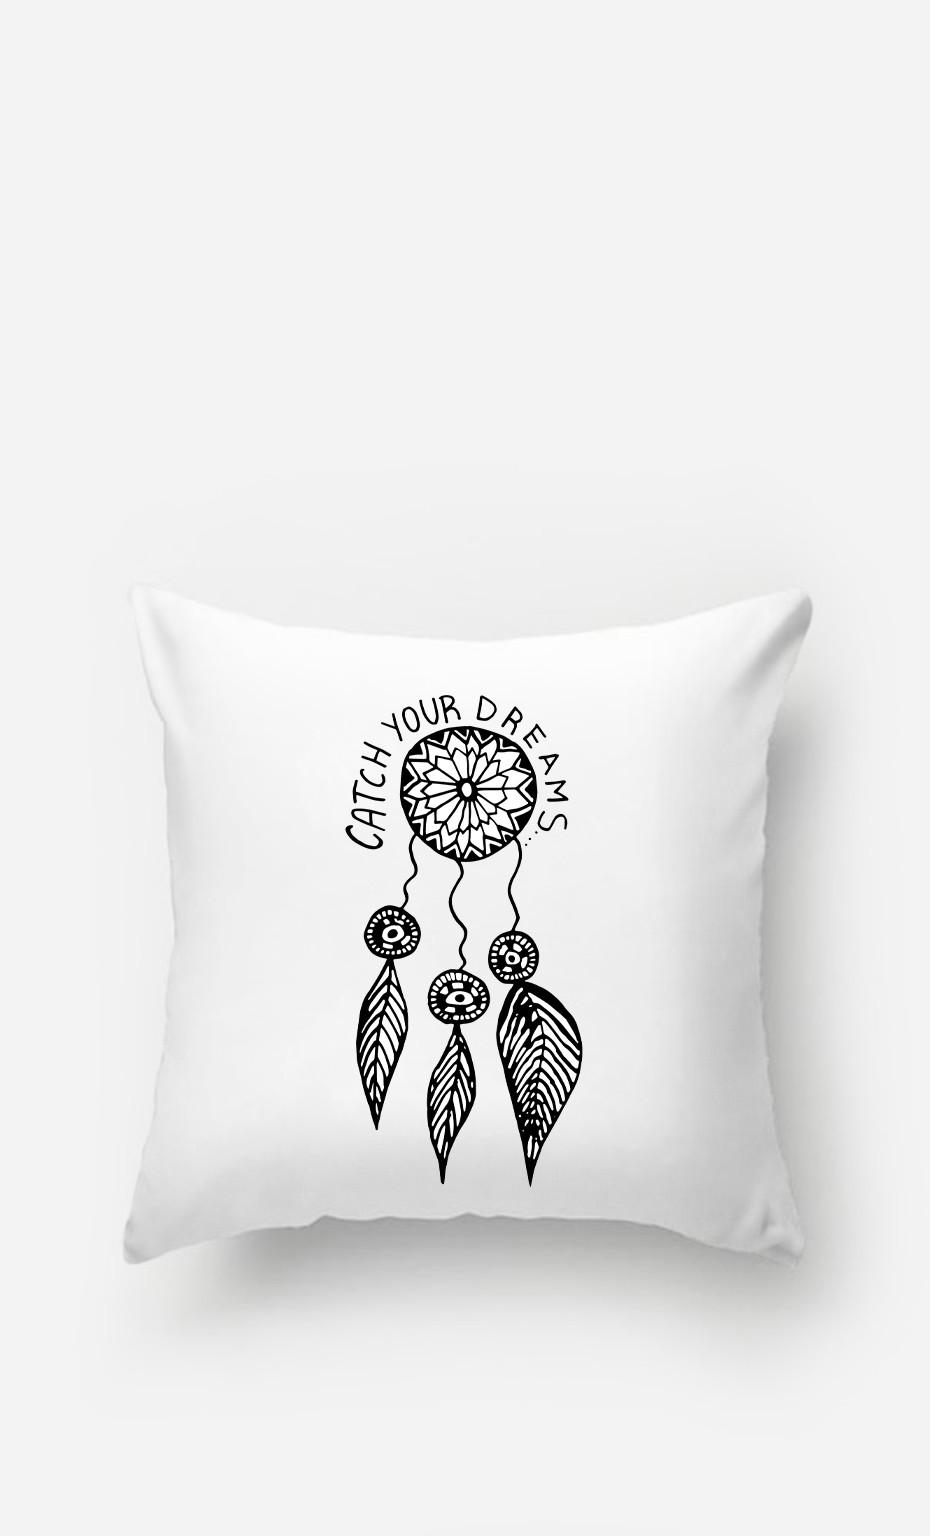 Pillow Catch Your Dreams